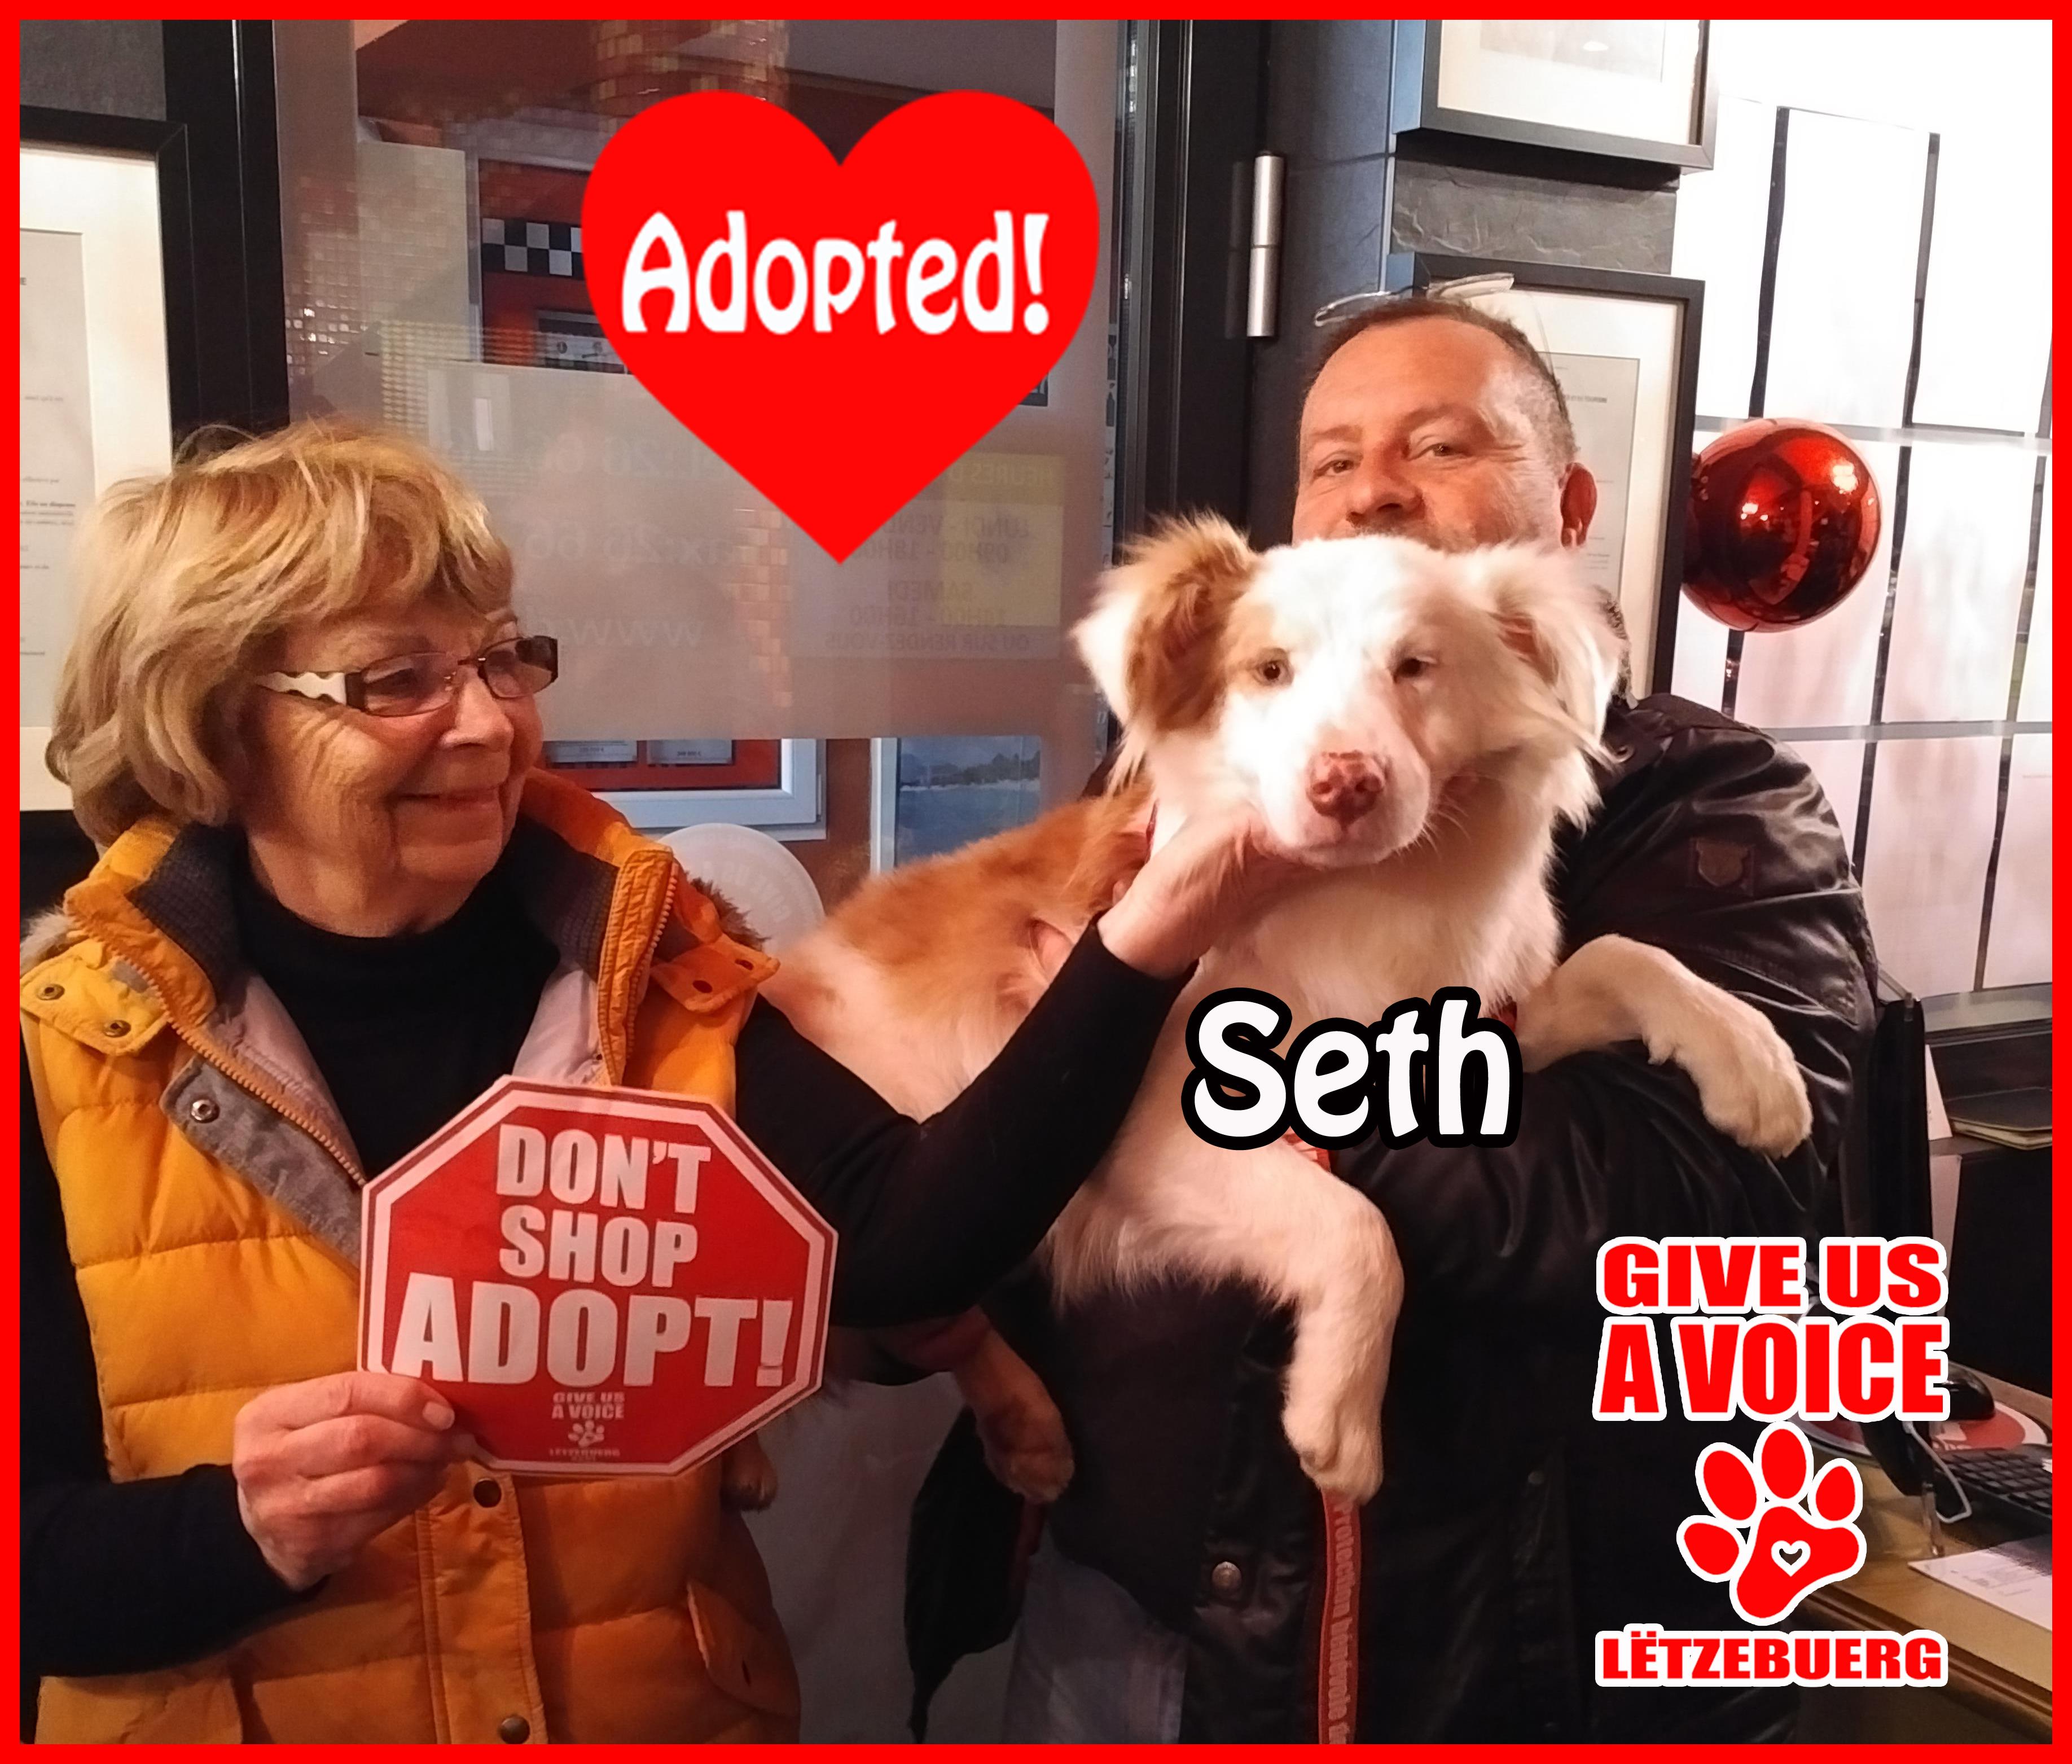 Seth Adopted! copy